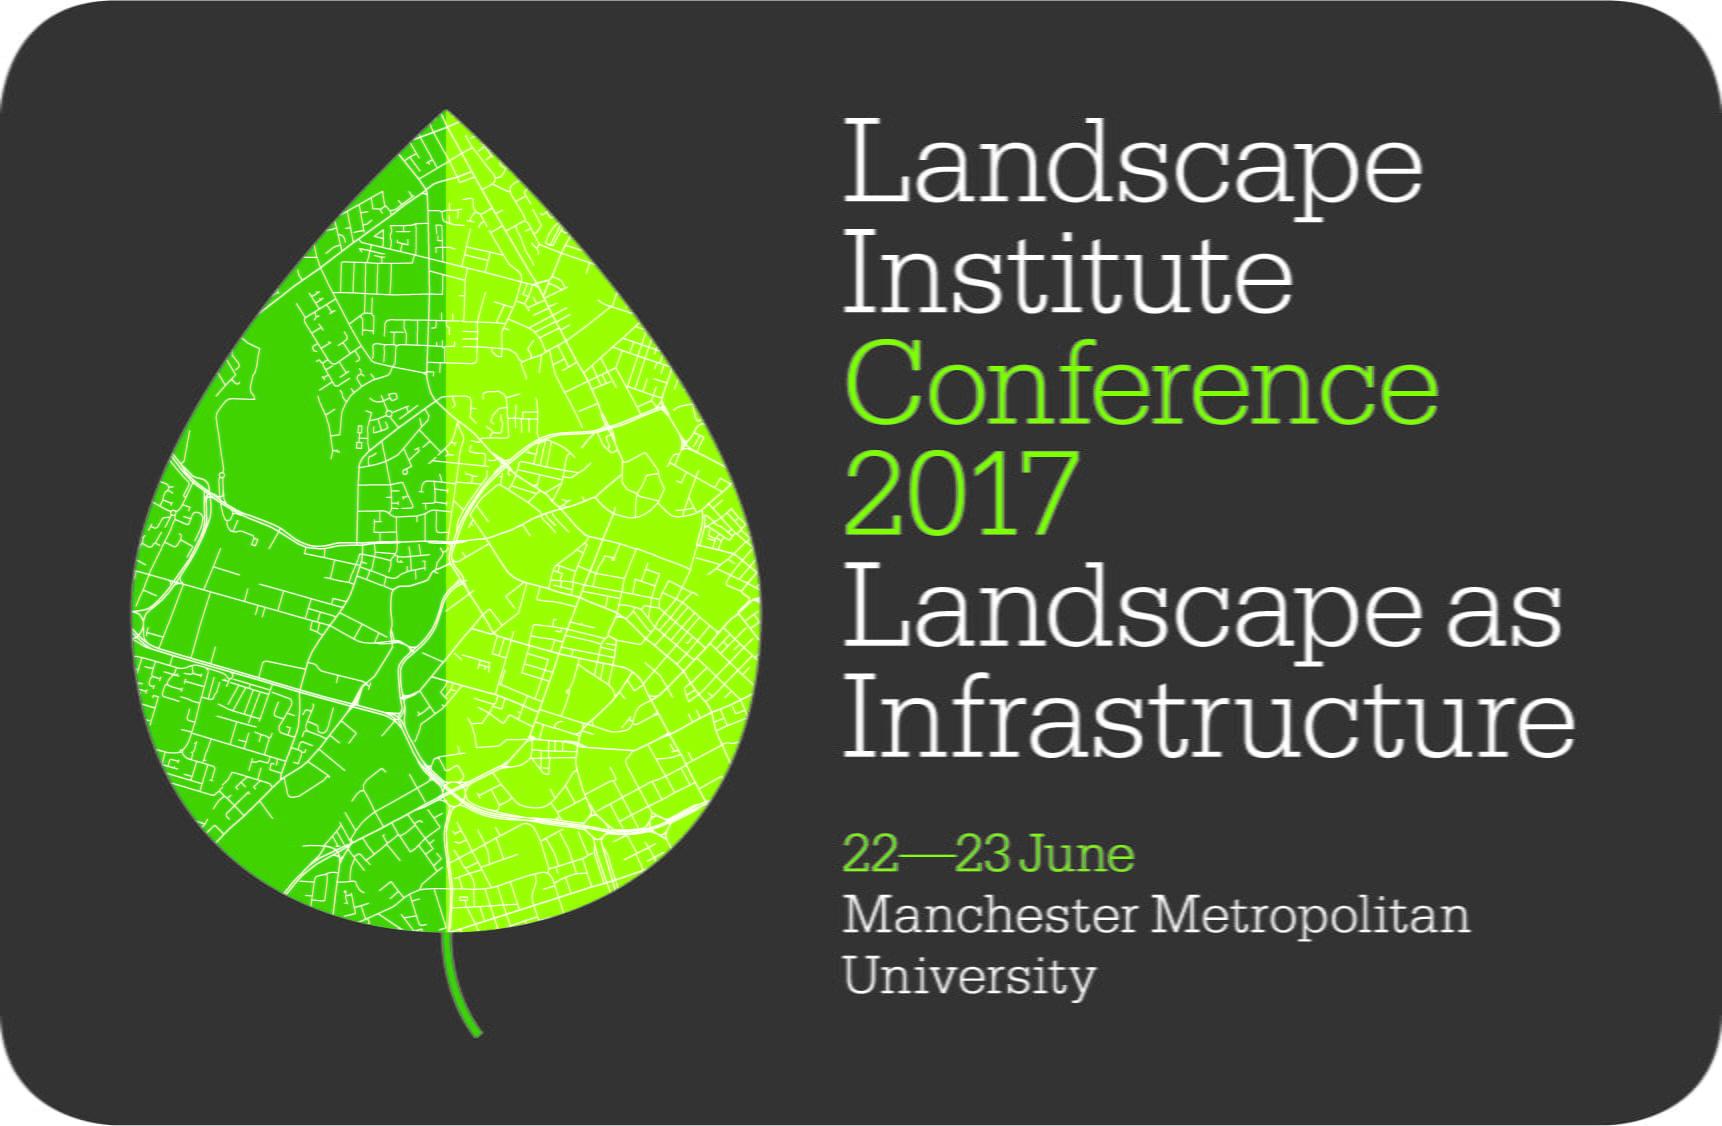 LI Conference 2017